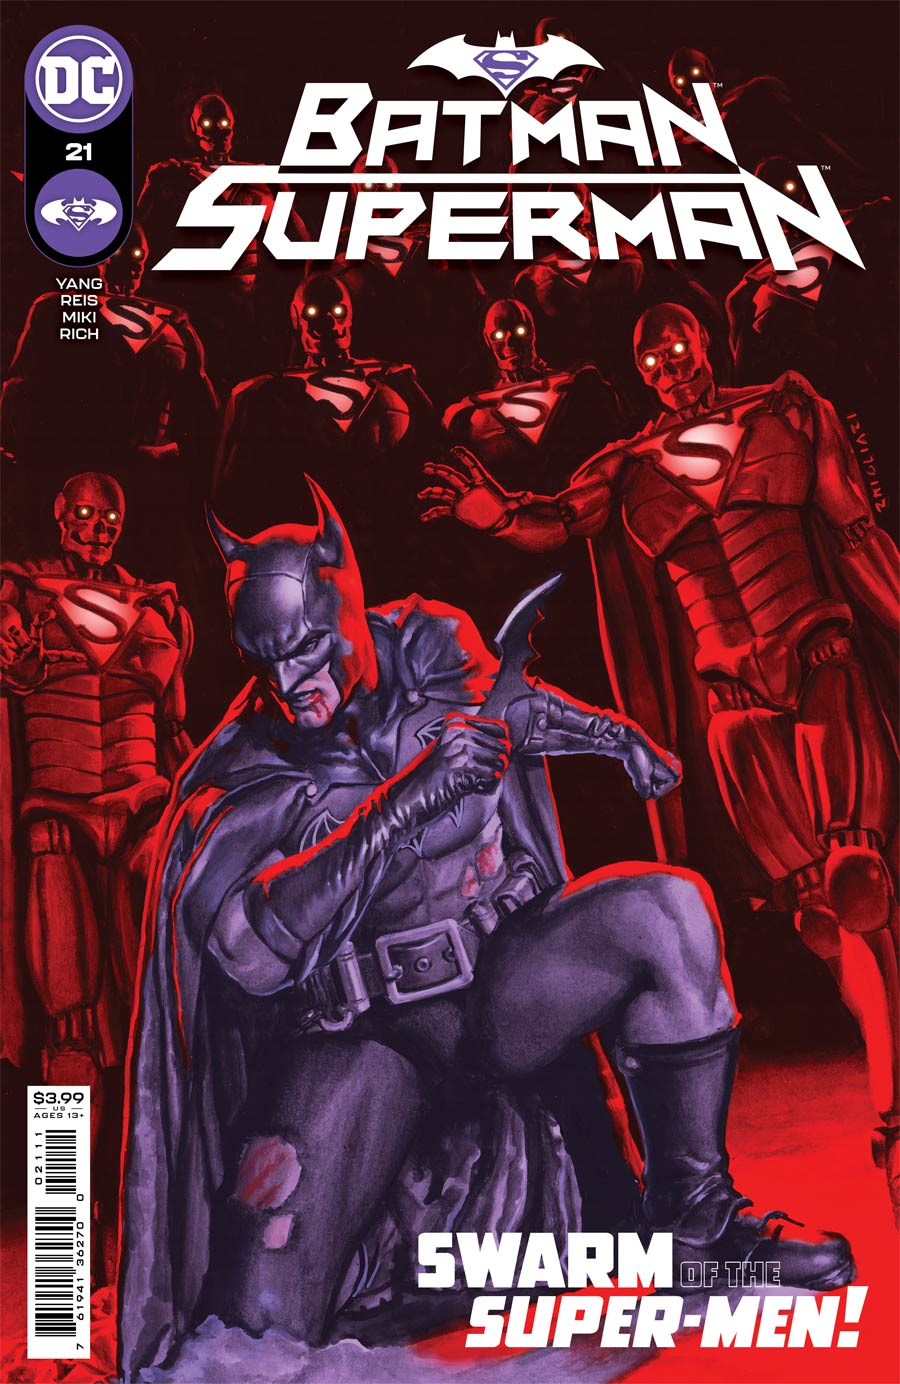 Batman Superman Vol 2 #21 Cover A Regular Rodolfo Migliari Cover